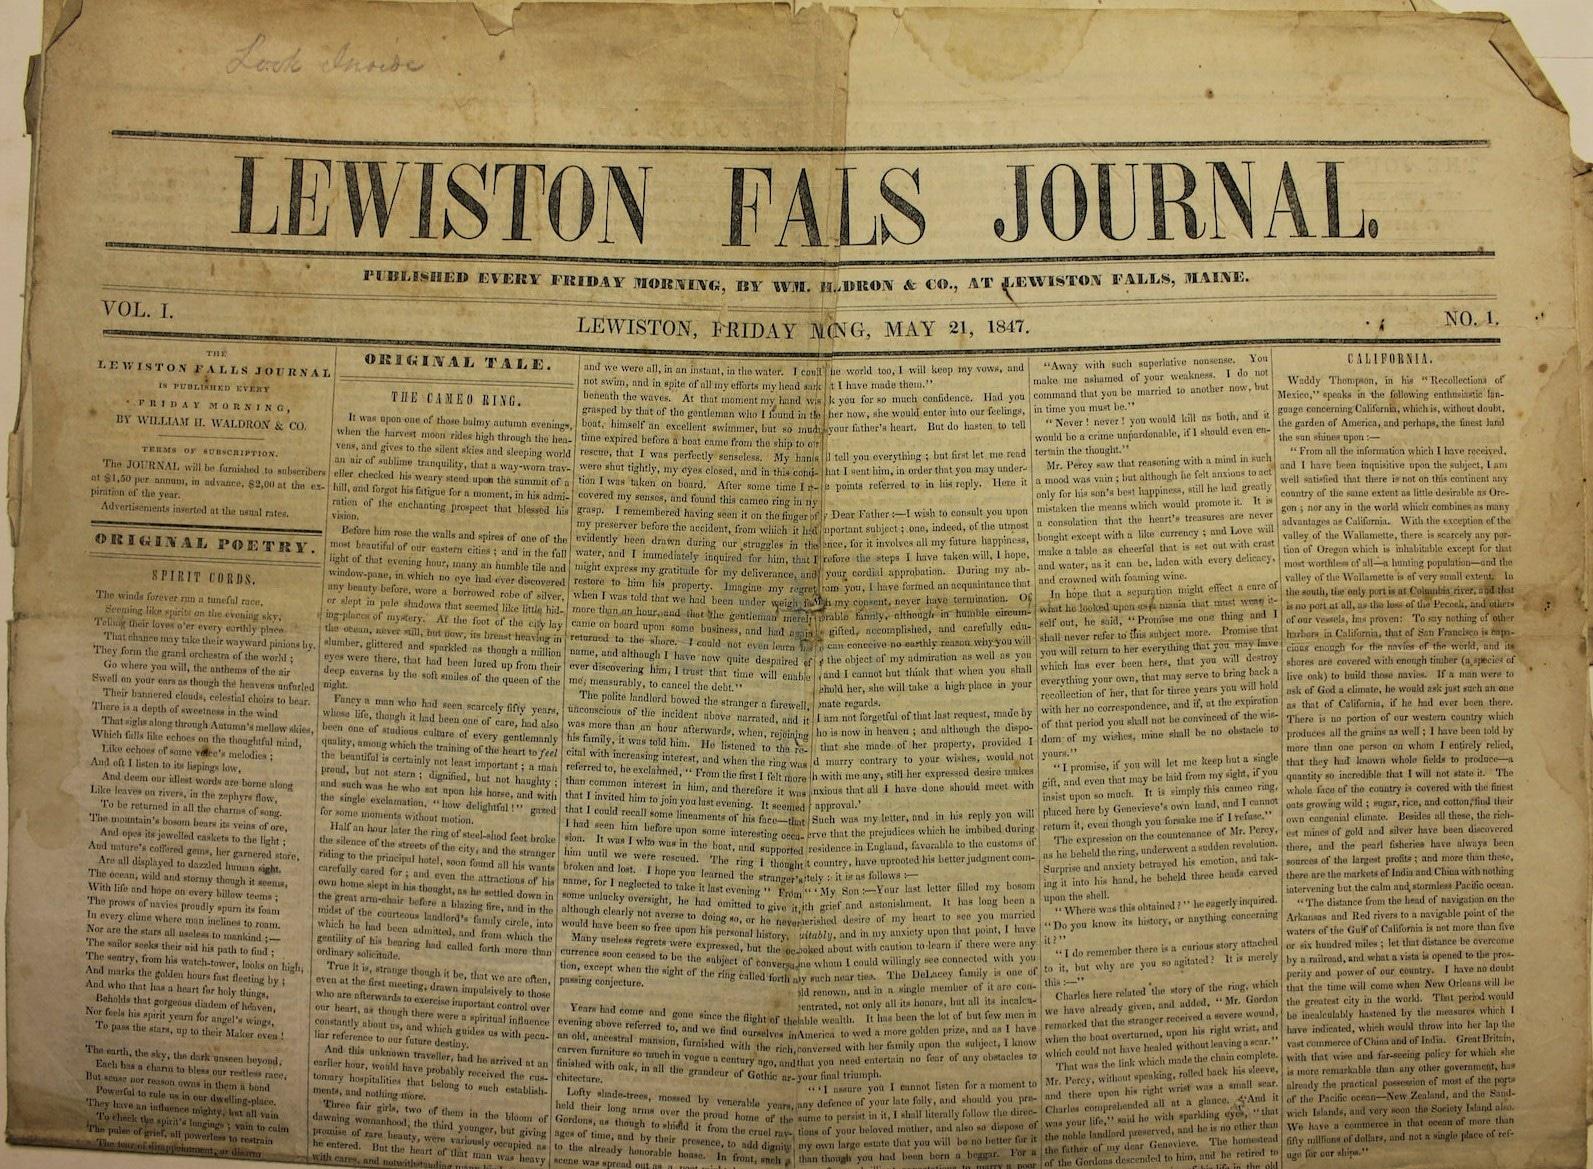 Lewiston Falls Journal